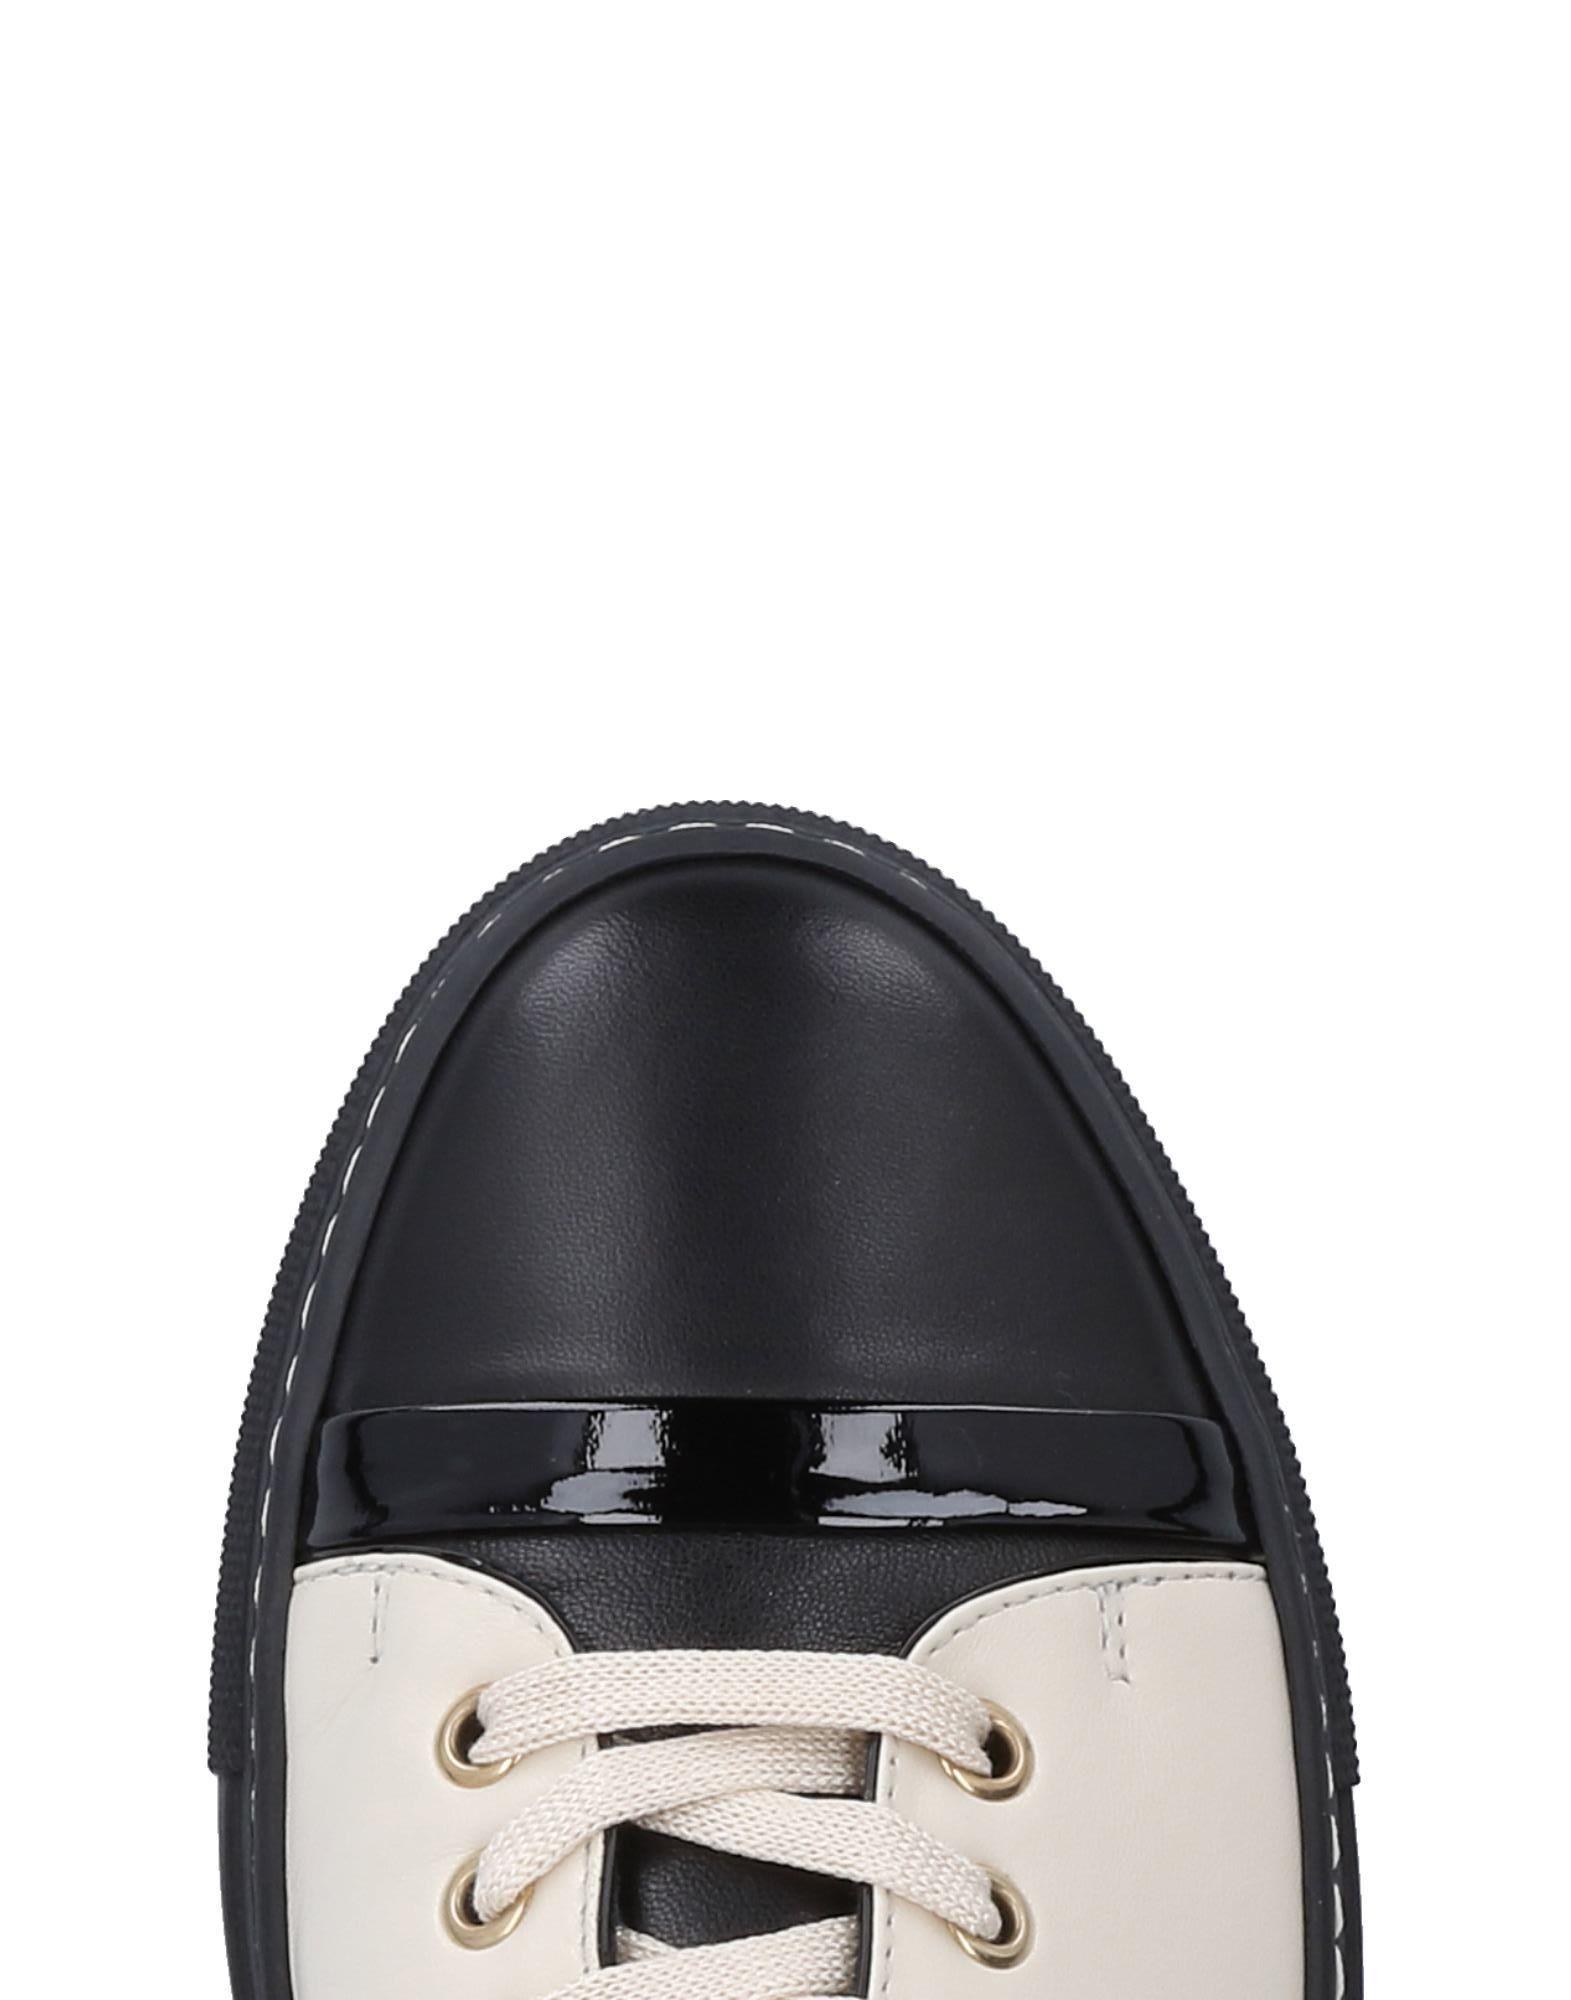 Rabatt  Schuhe Lanvin Sneakers Damen  Rabatt 11503227QK 15f55a